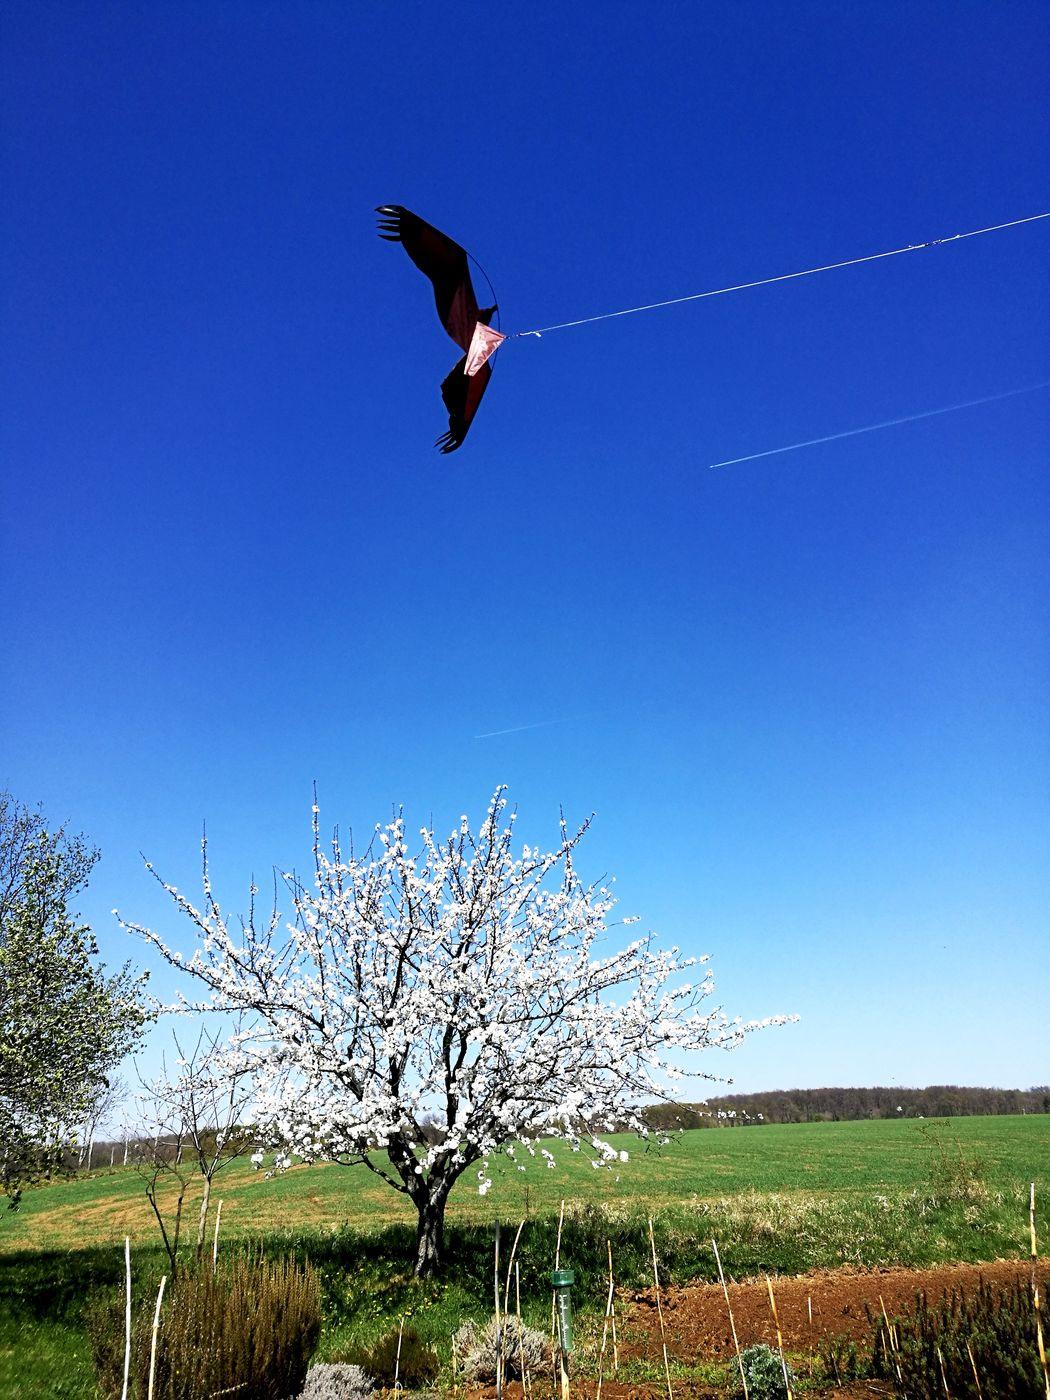 Kite Flying Clear Sky Sky No People Tree Birdscarrer Zero Wind Kite EyeEmNewHere EyeEm New Here